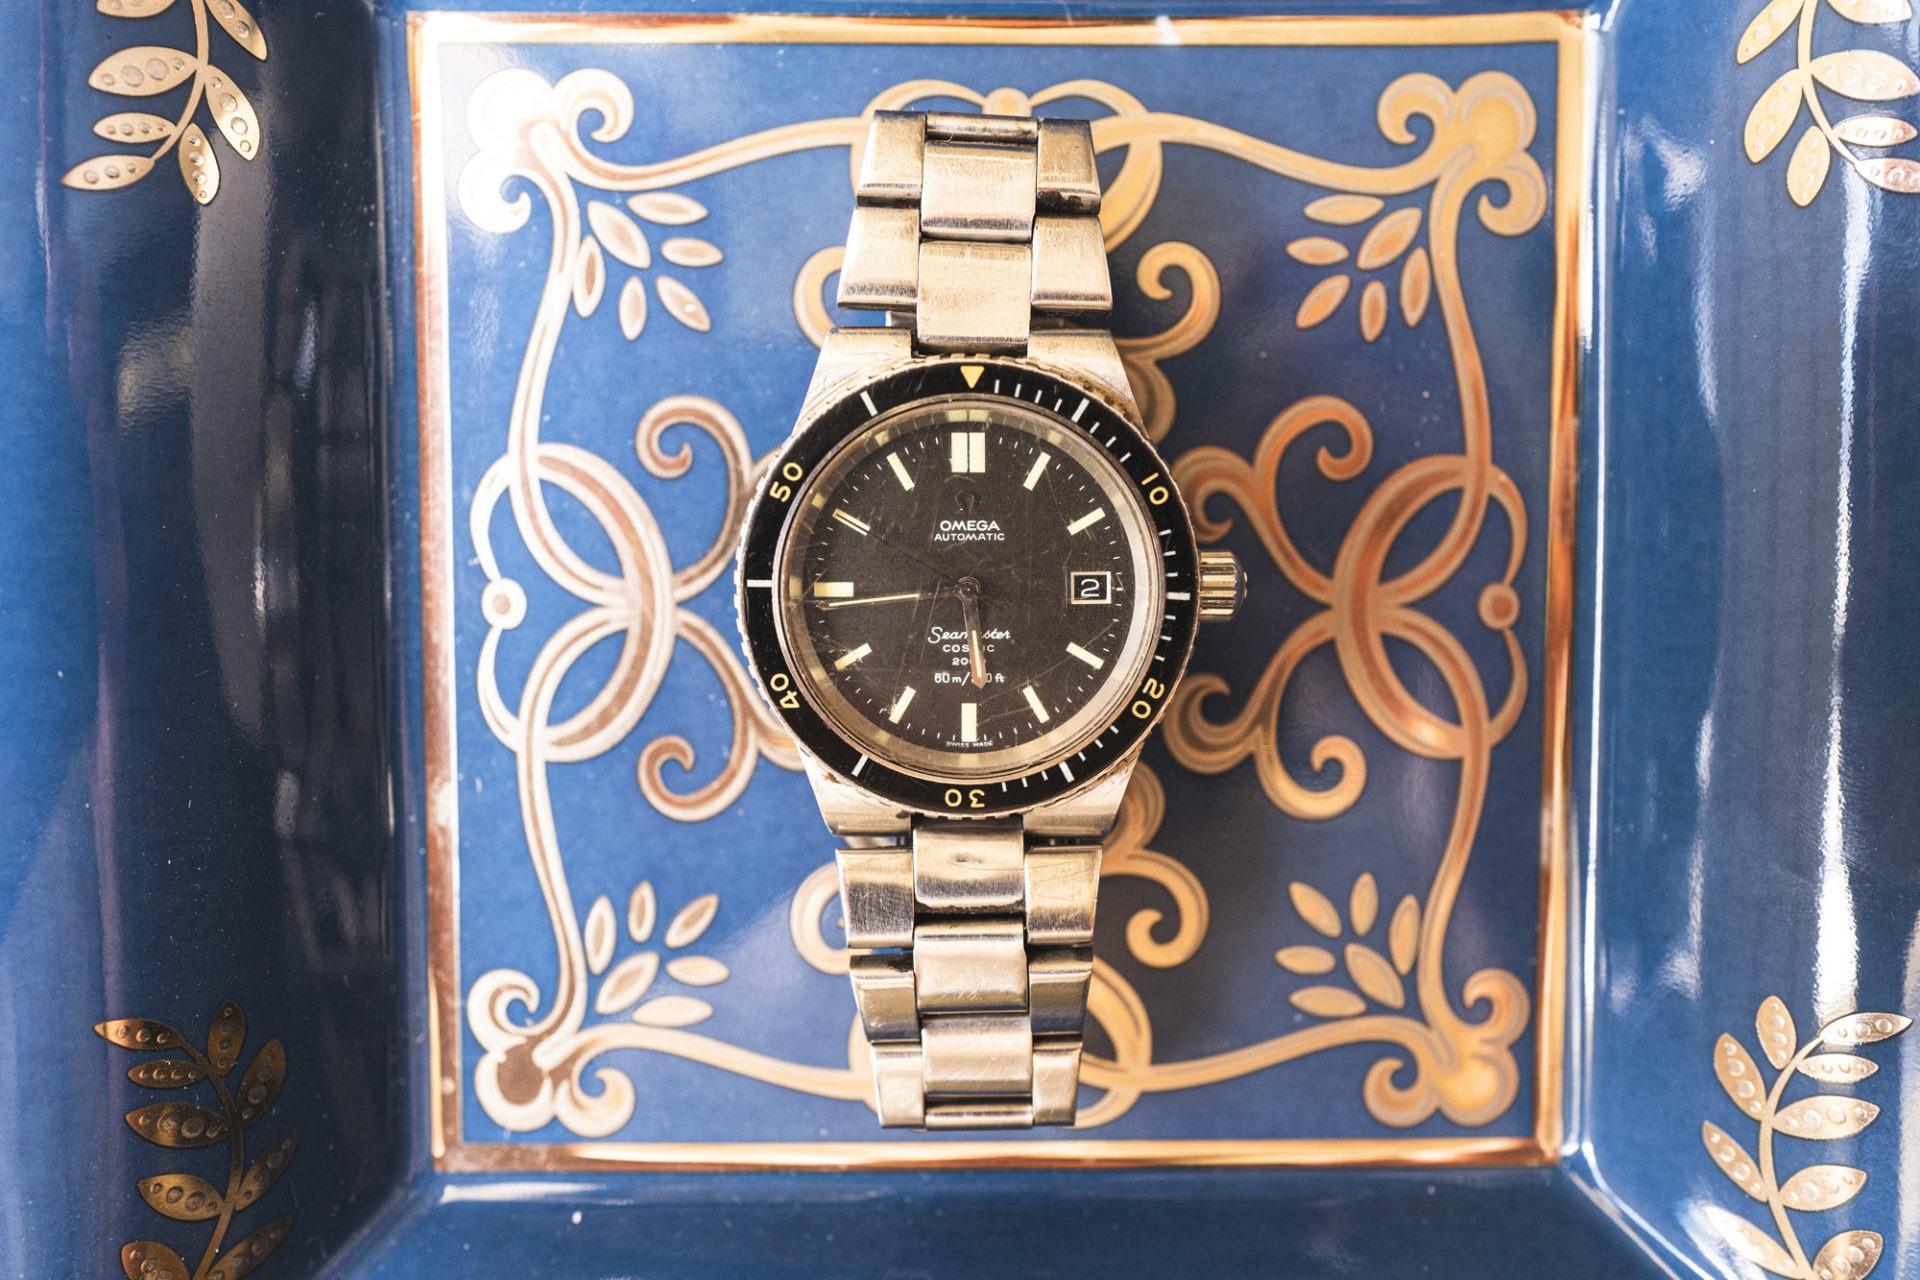 Omega Seamaster Cosmic 2000 - Vente importante de montres de collection par Tajan le 2 juillet